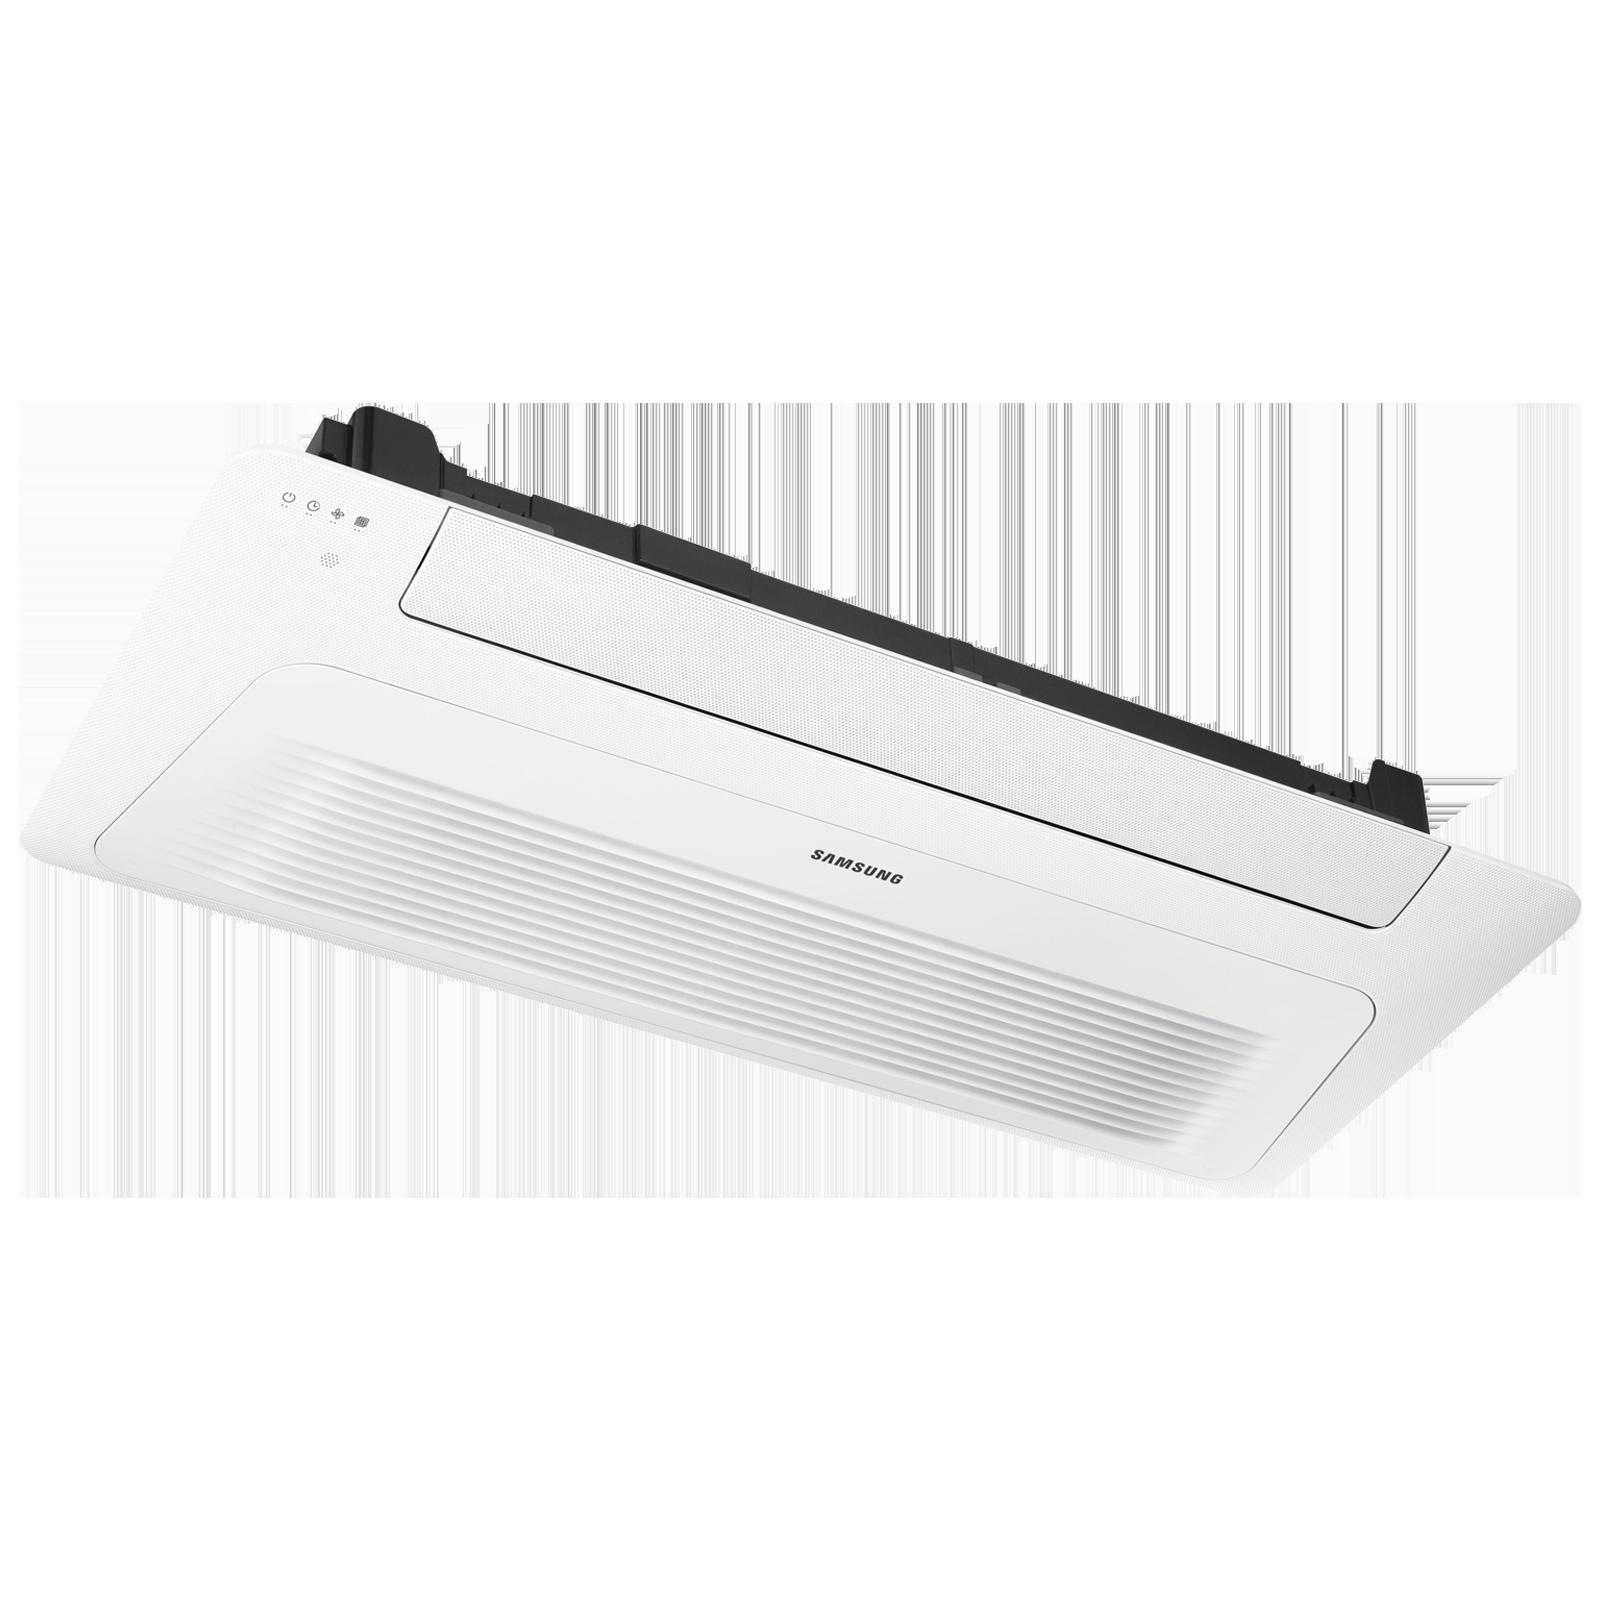 Samsung 1 Way Cassette 1 Ton 3 Star Inverter Cassette AC (Wi-Fi AC, Copper Condenser, AC036NN1PKC/TL, White)_2